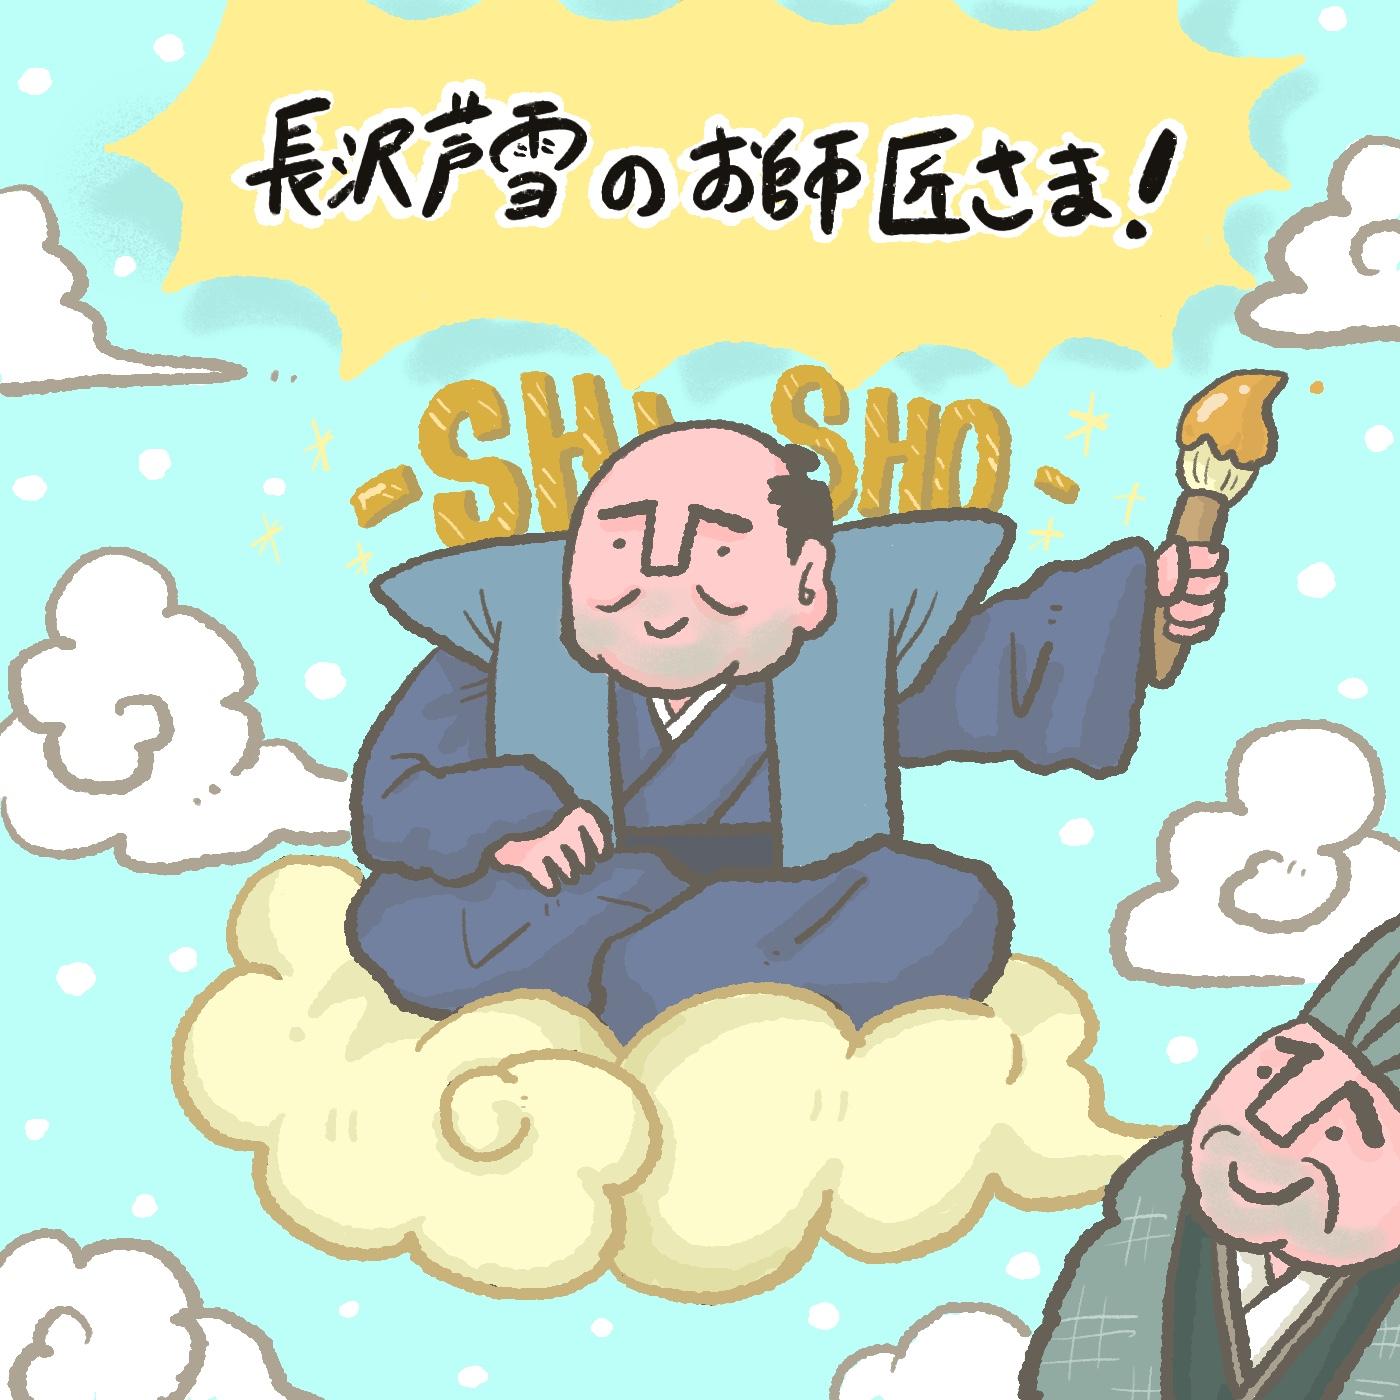 OBIKAKE ナニソレ 長沢芦雪